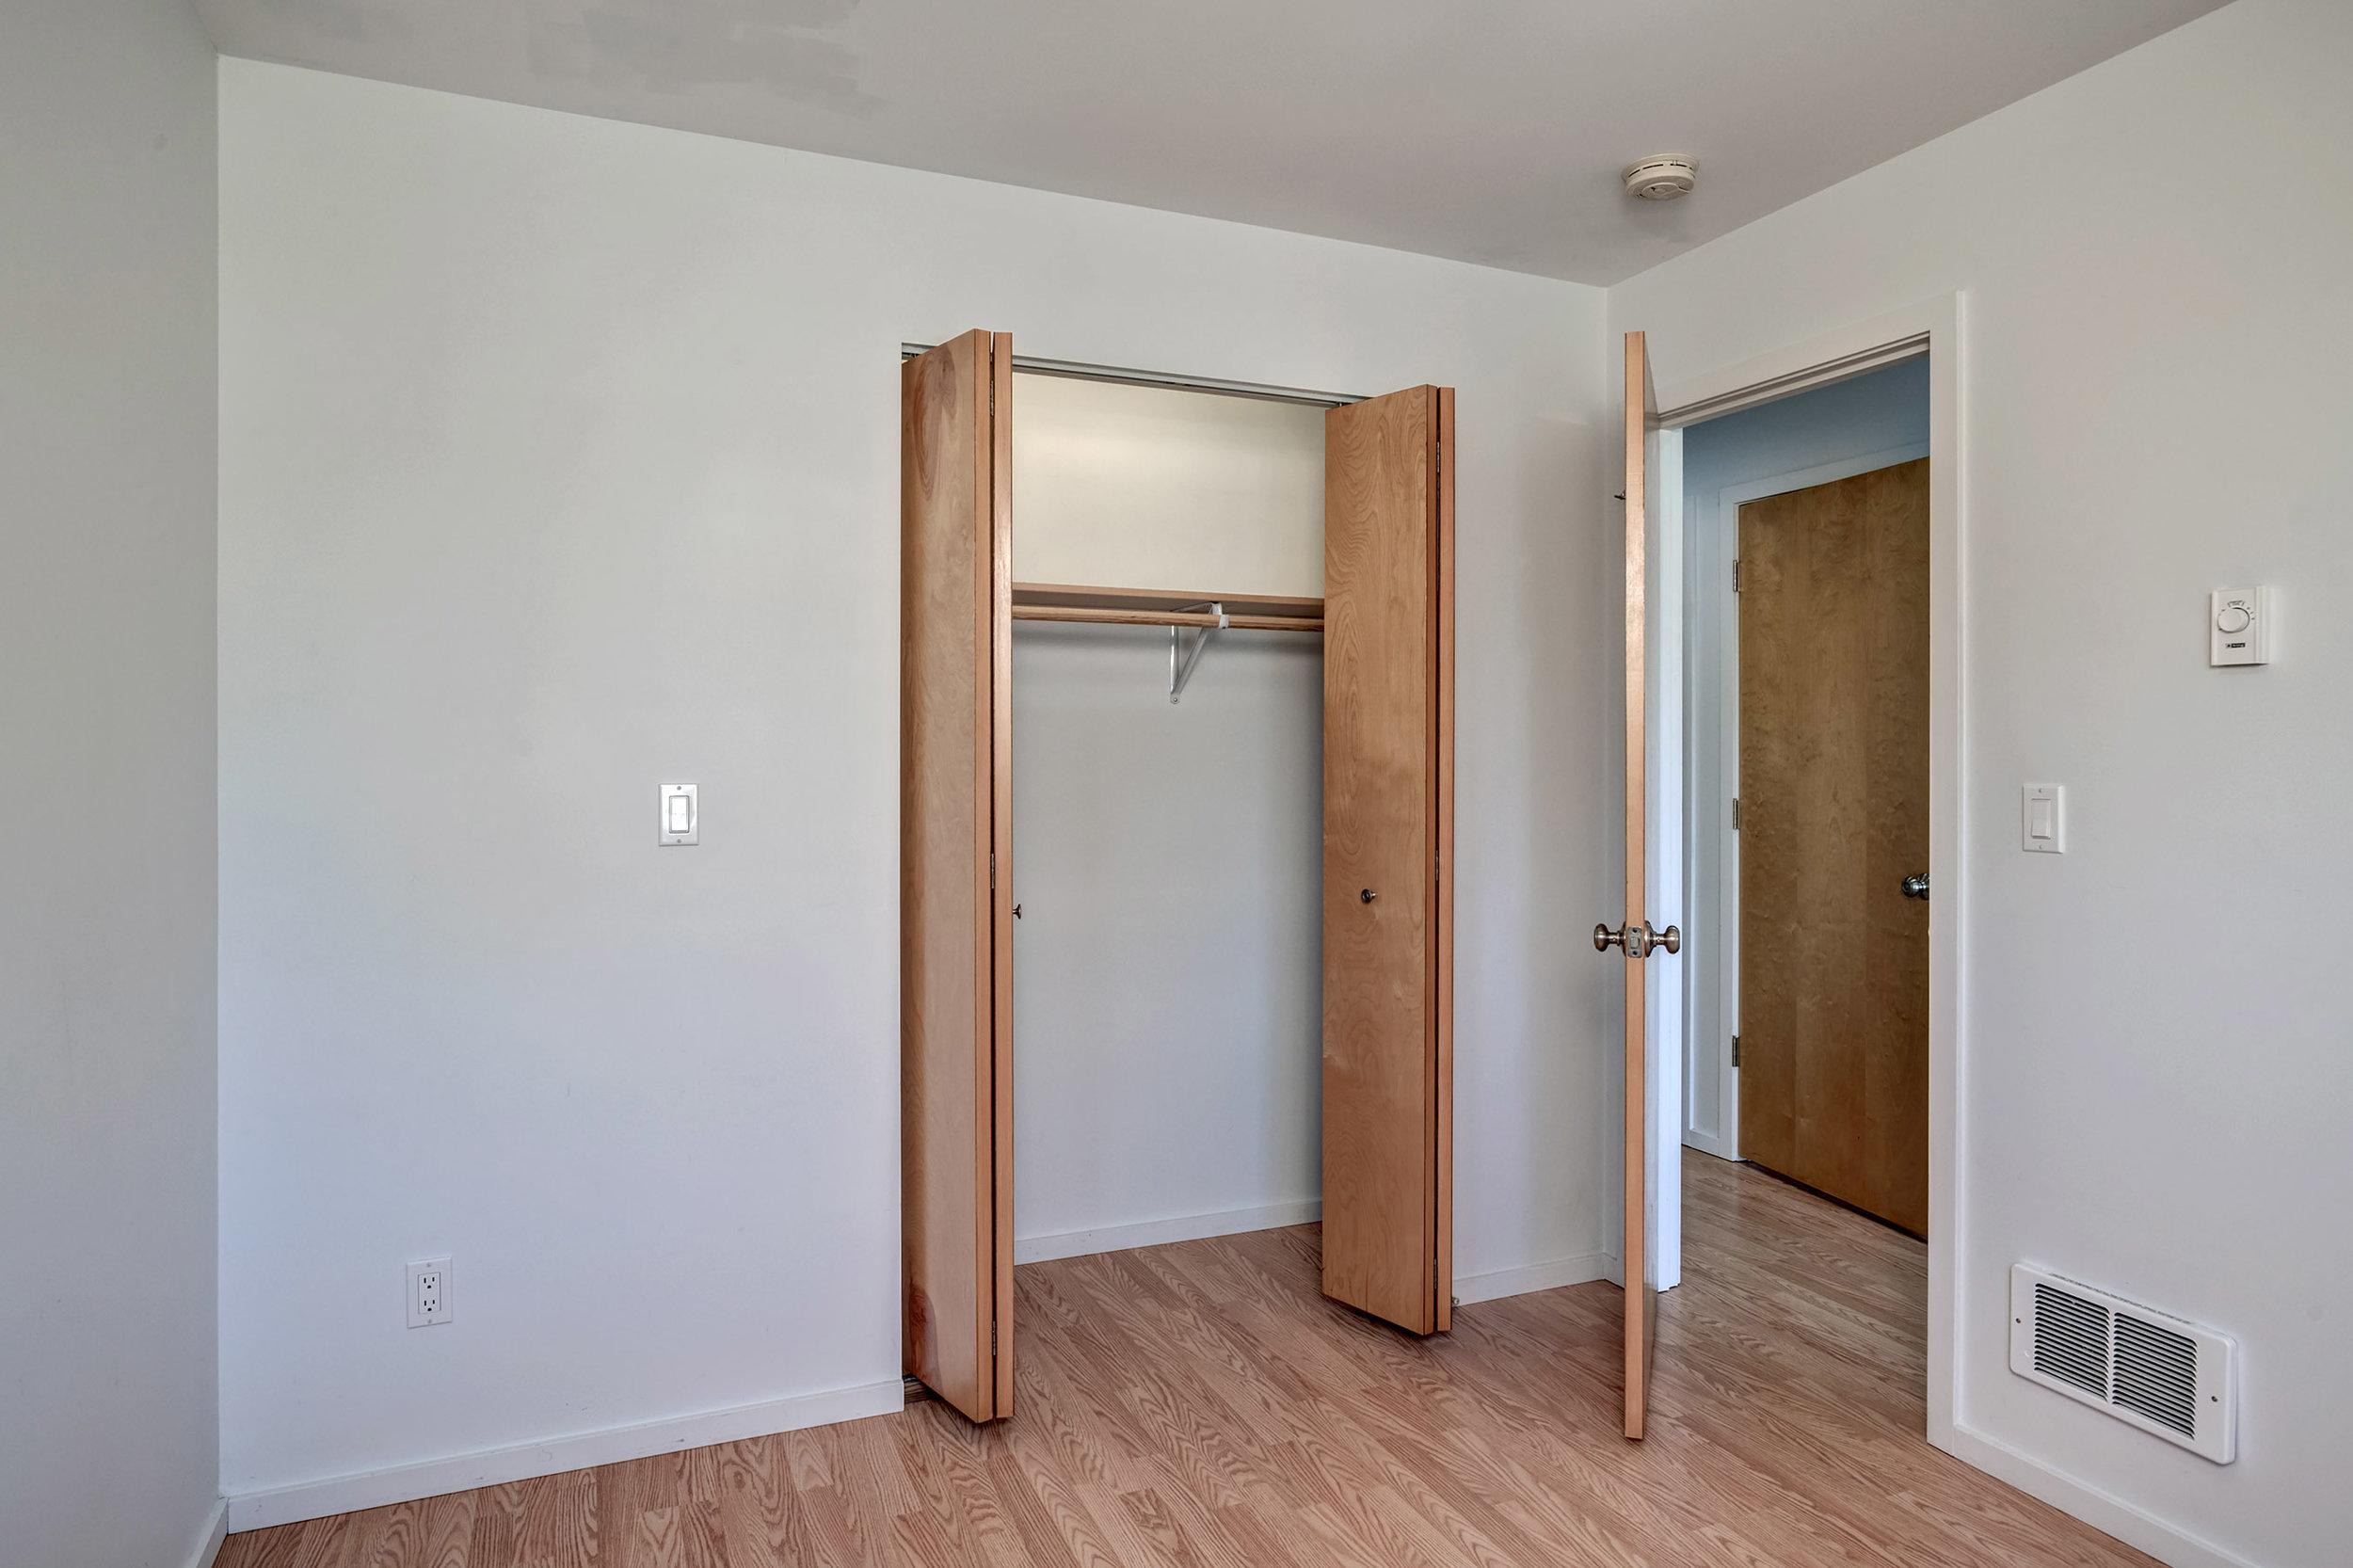 04-Bedroom02.jpg